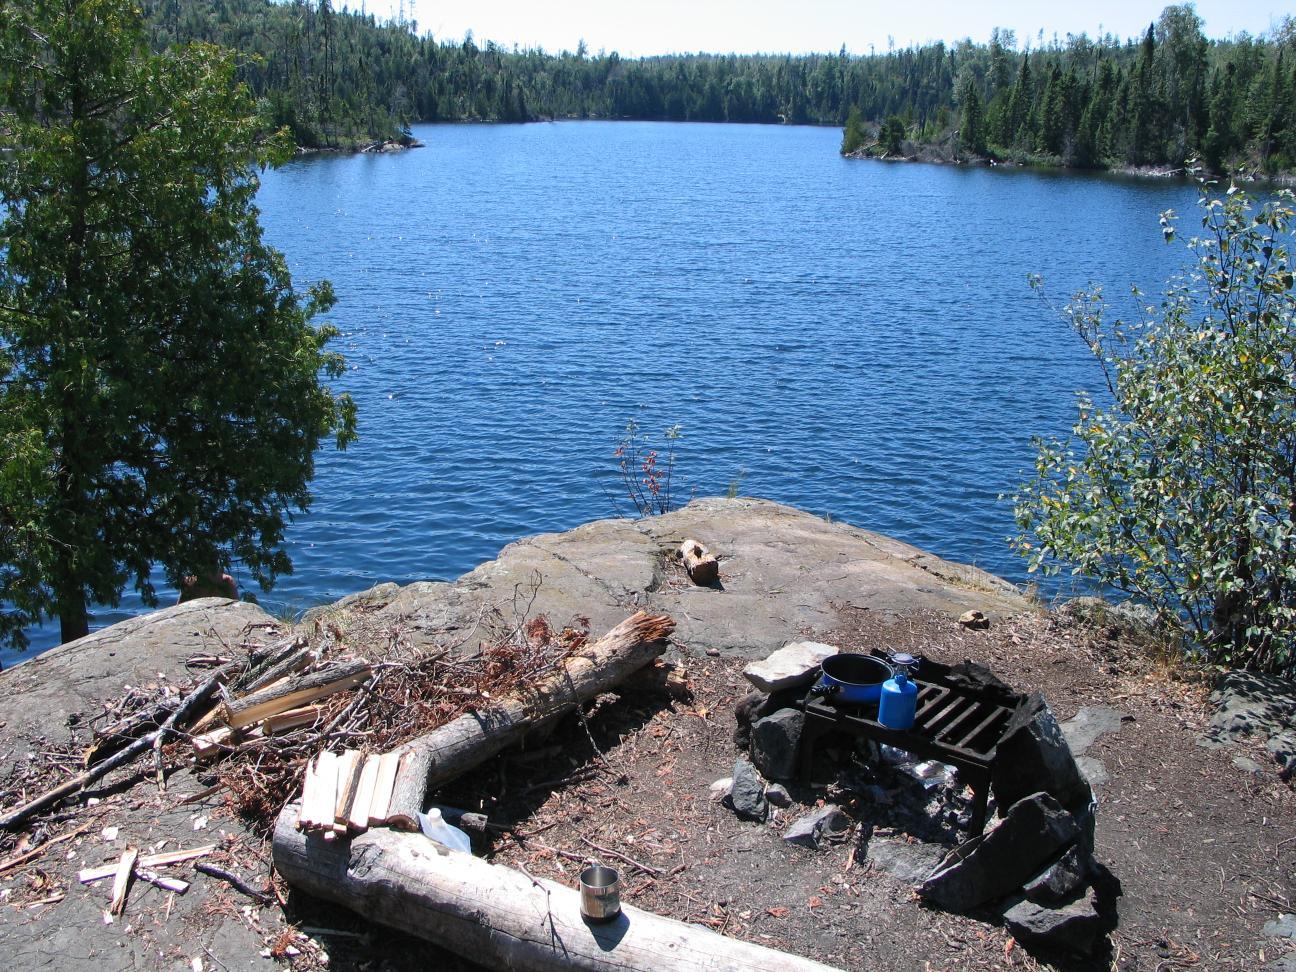 Island campsite - Paulson Lake